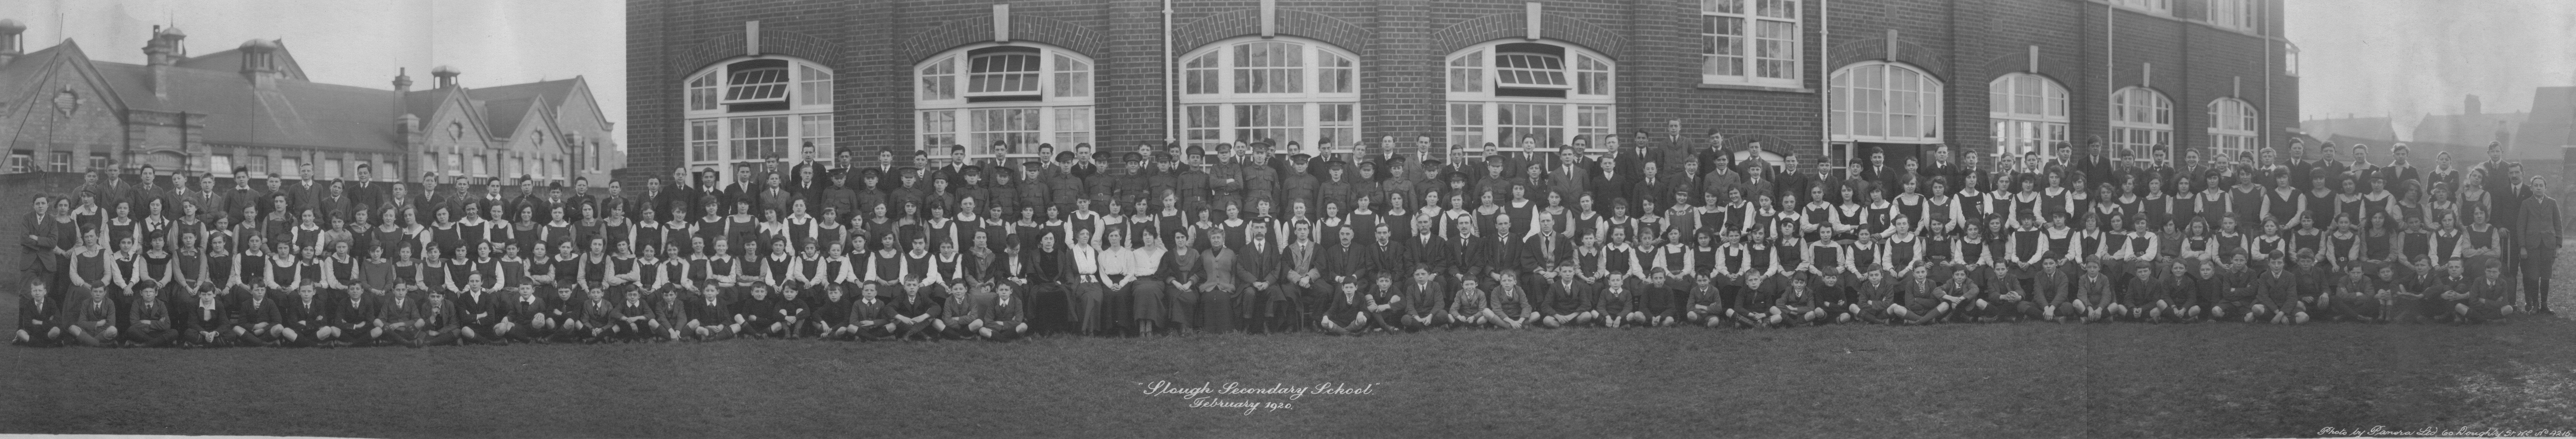 Slough Secondary School. 1920